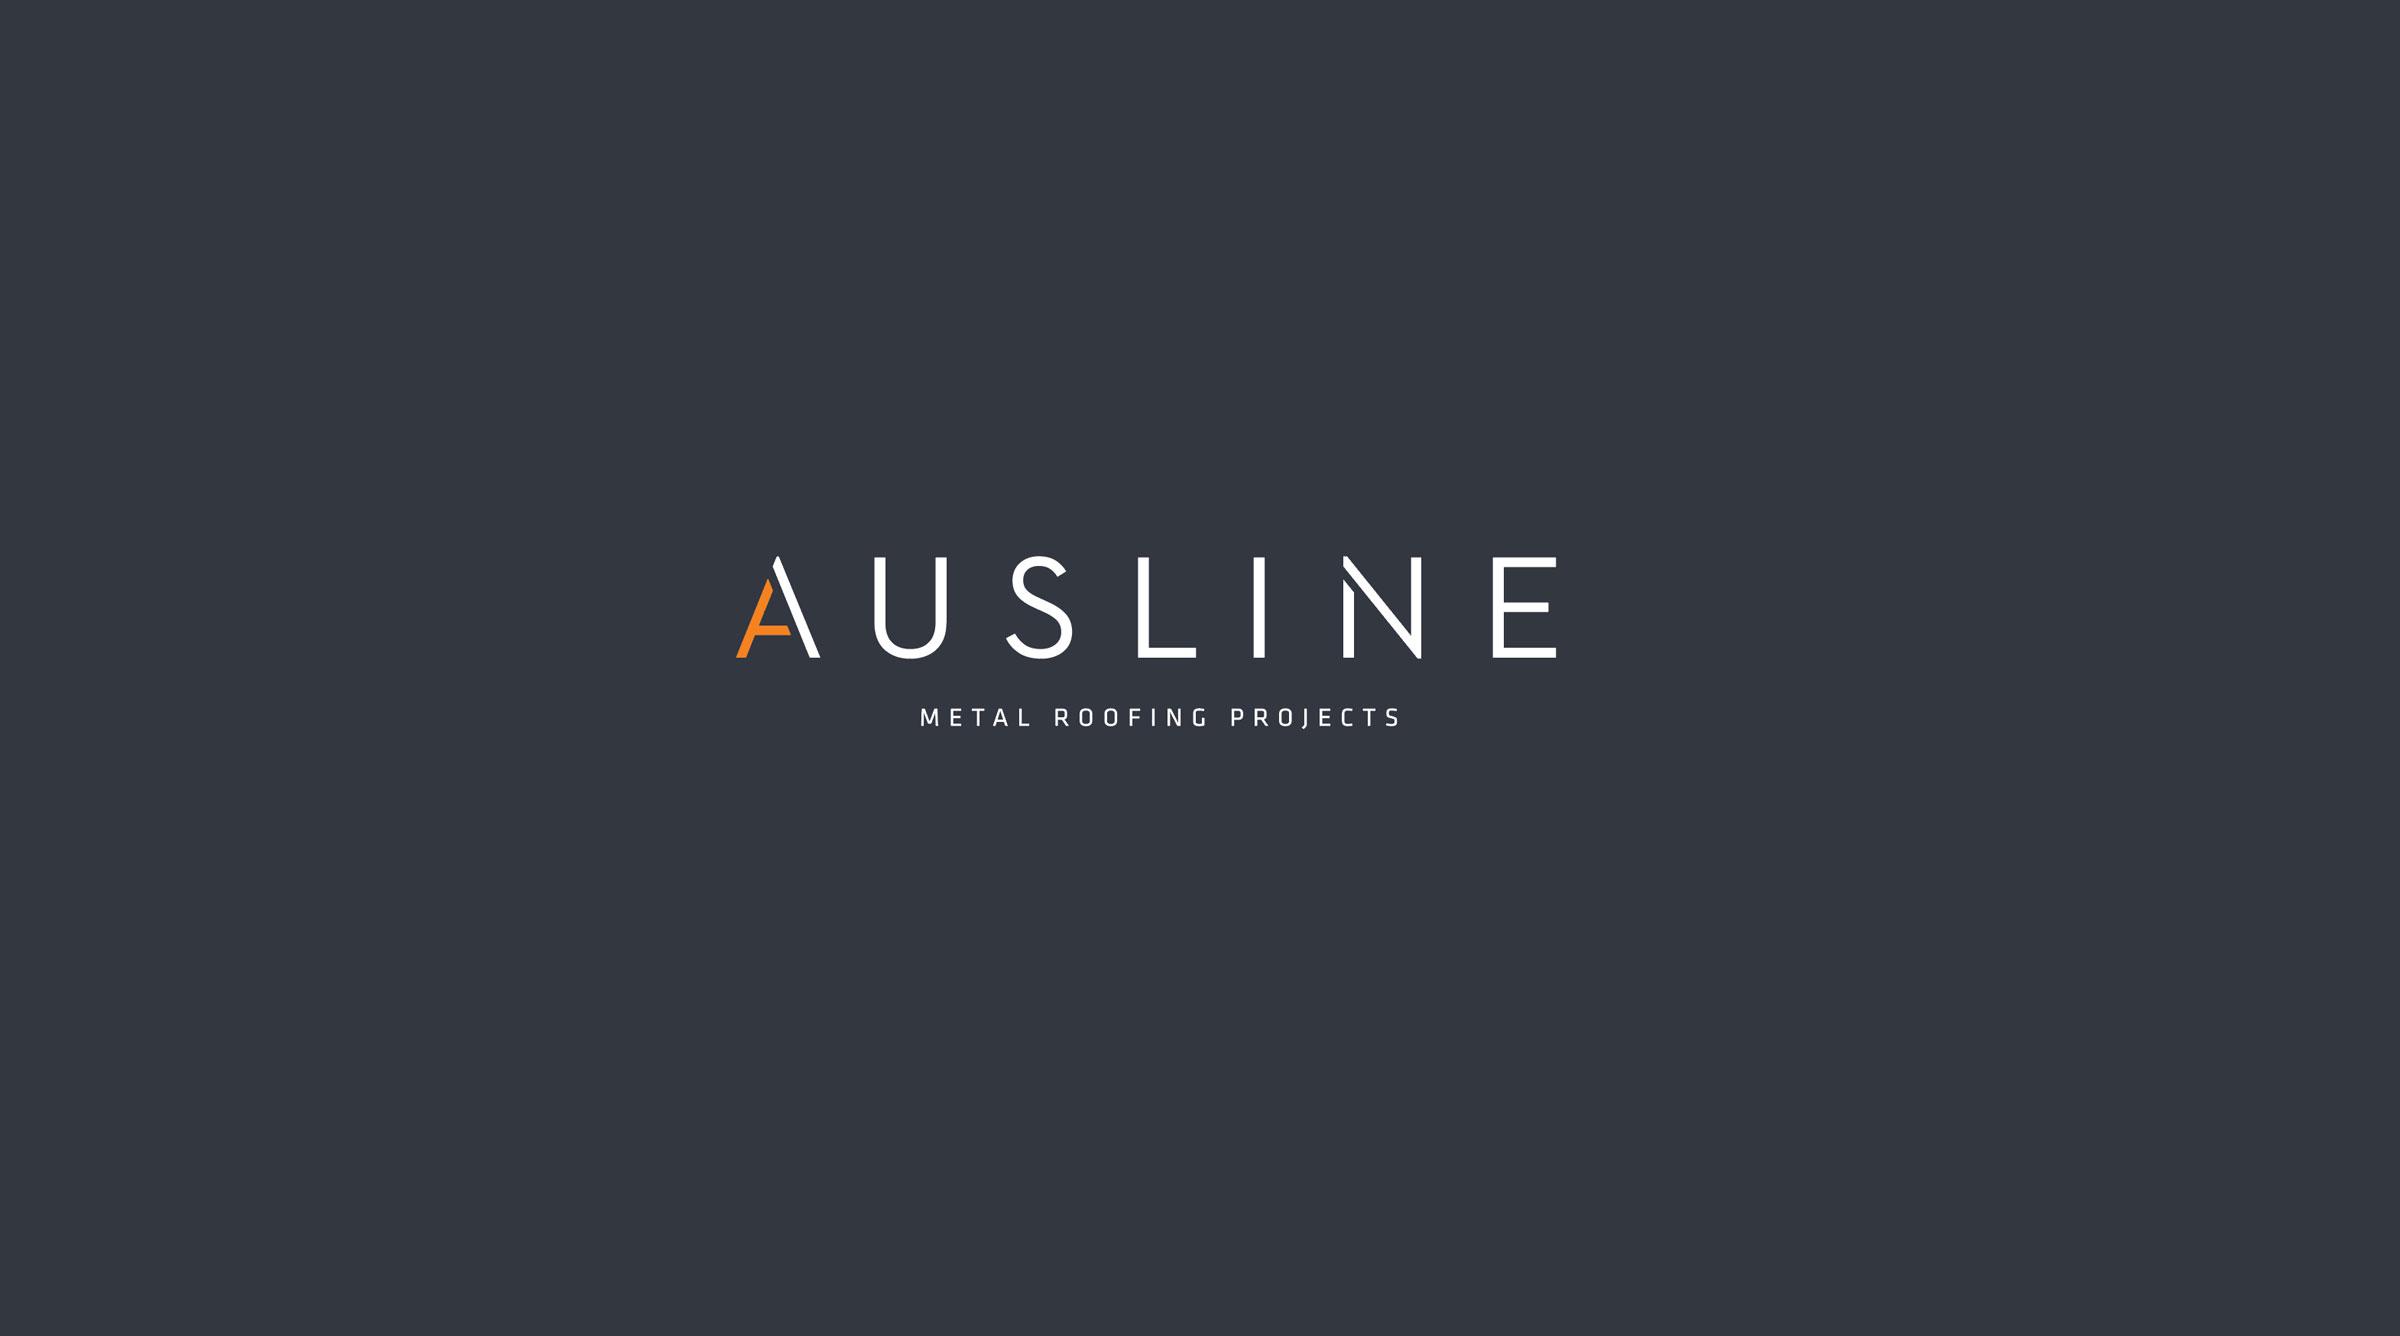 Ausline-Website-Copywriting-3.jpg